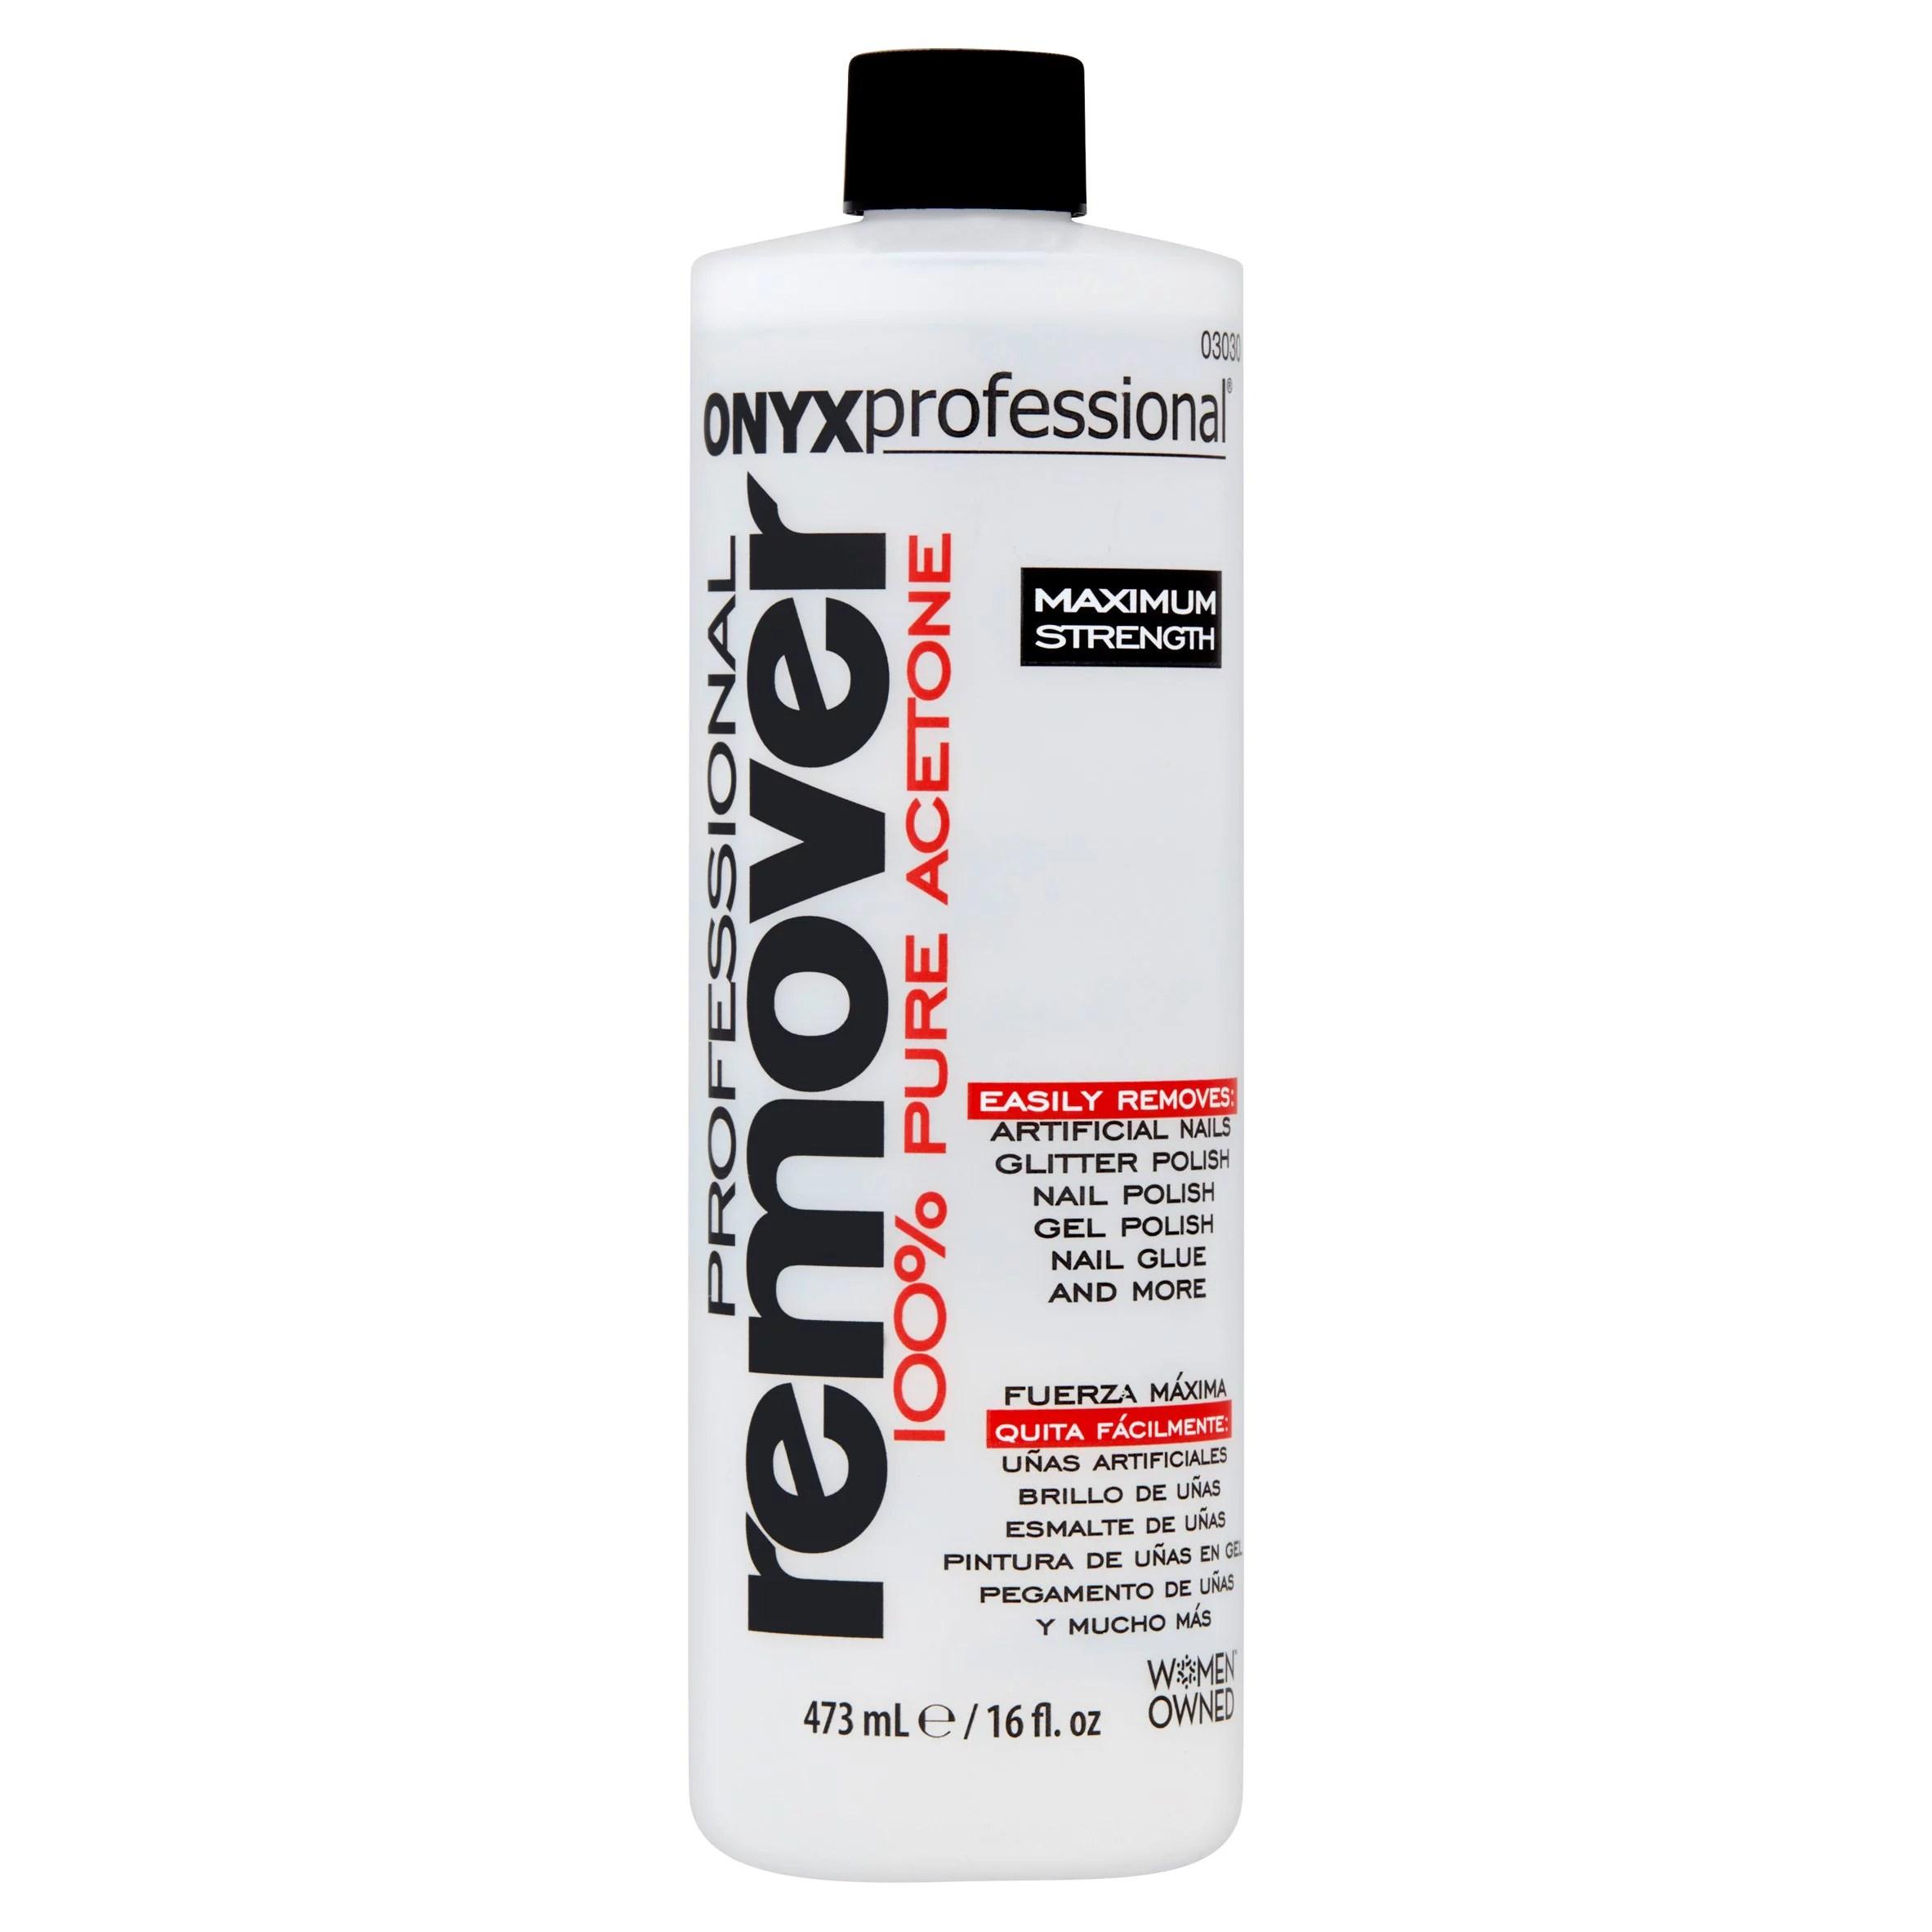 Onyx Professional Maximum Strength Nail Polish Remover 16 Fl Oz Walmart